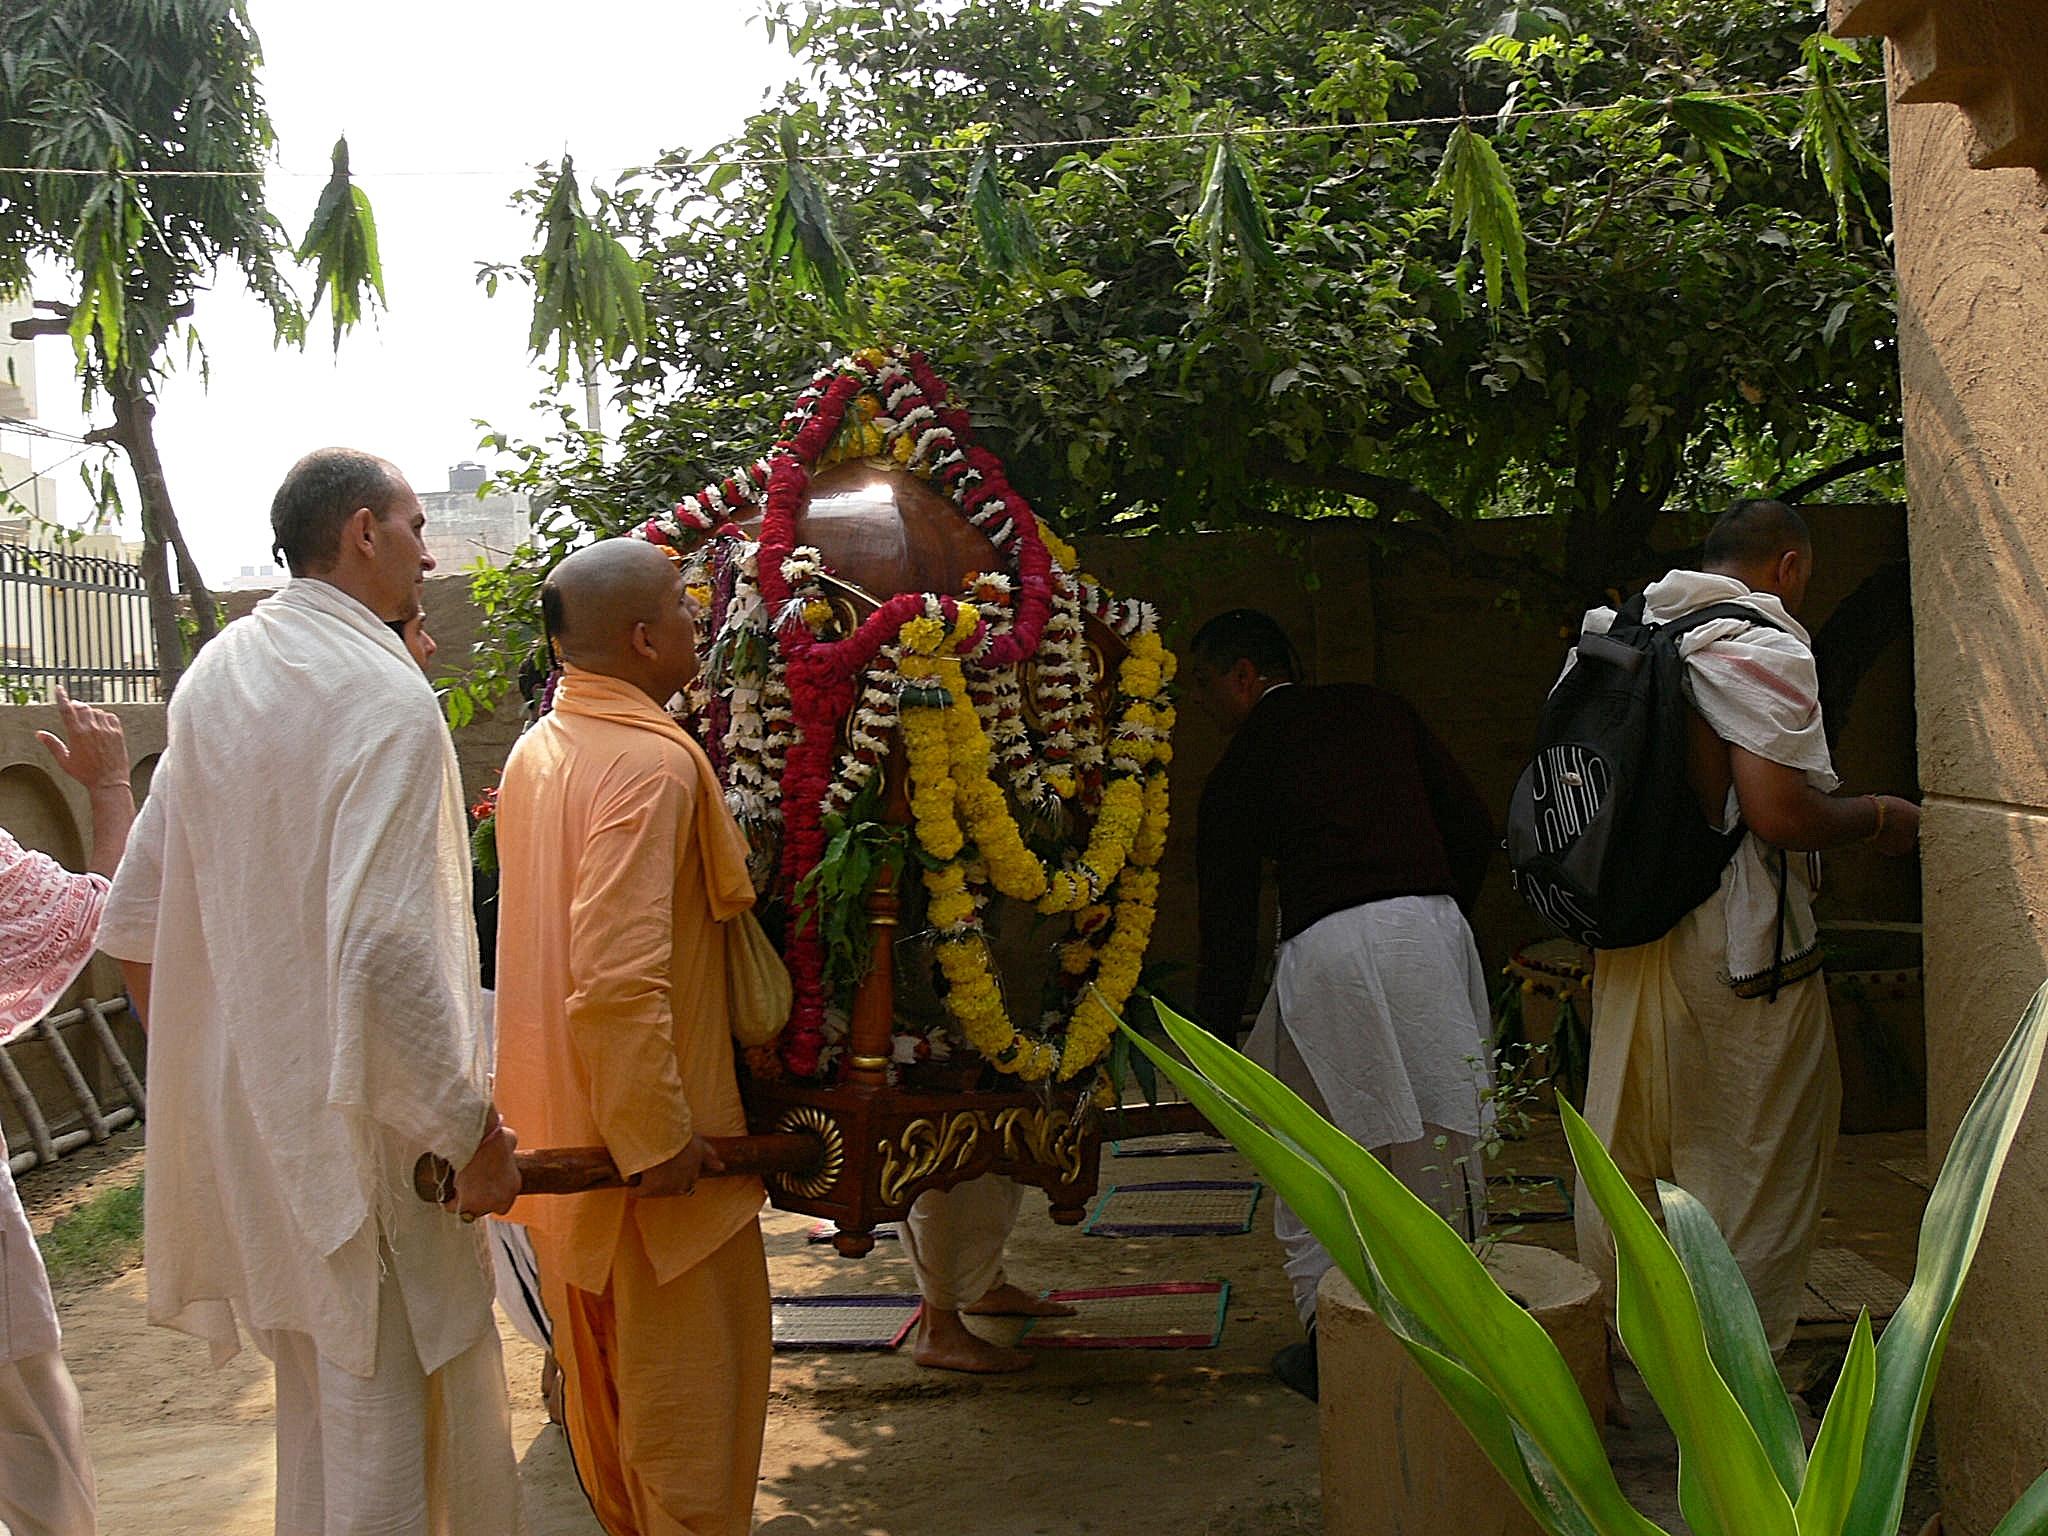 Radha Madhava arriving at a courtyard festival